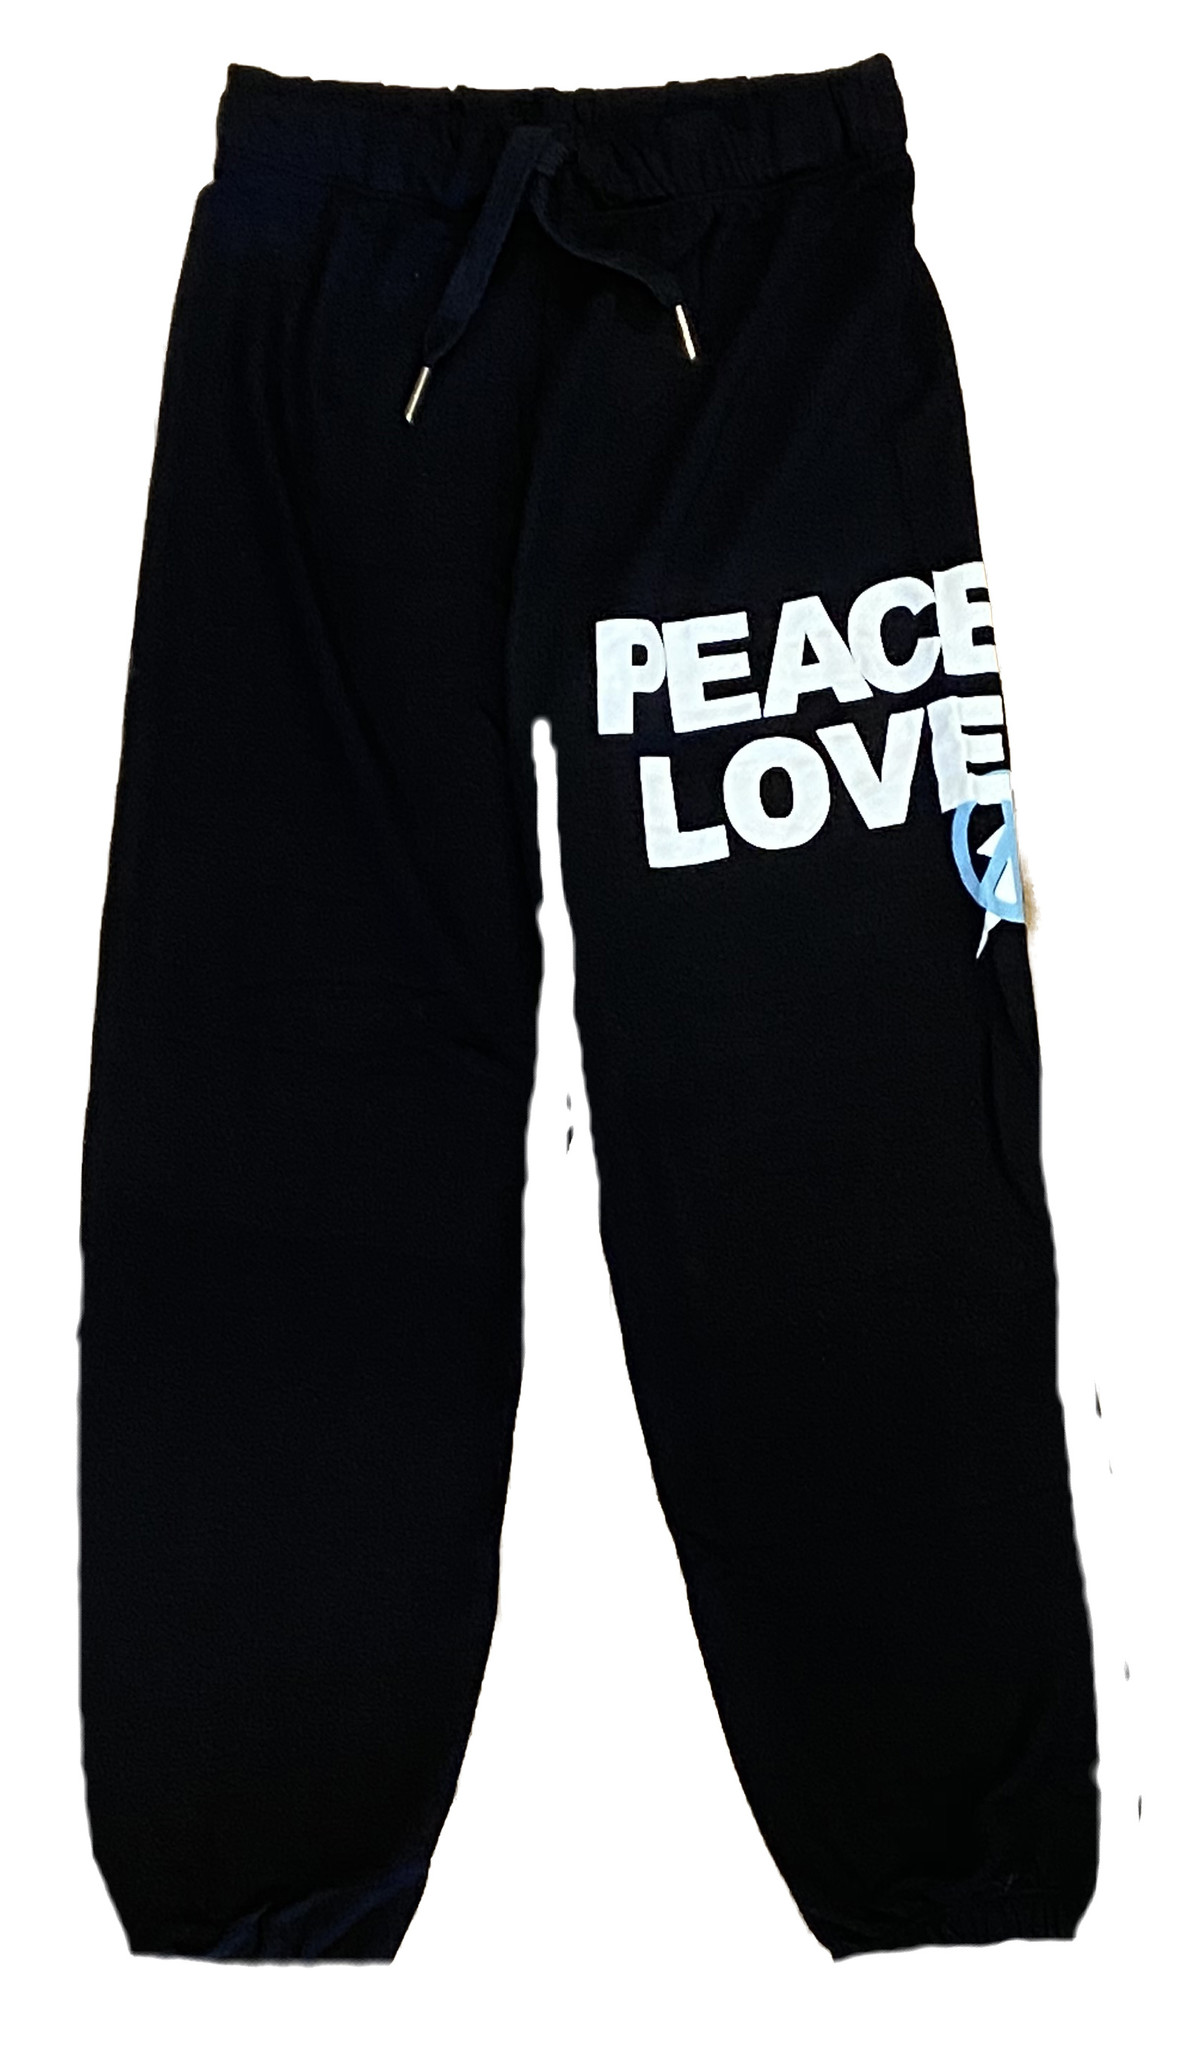 Flowers by Zoe Black Peace/Love Sweatpant